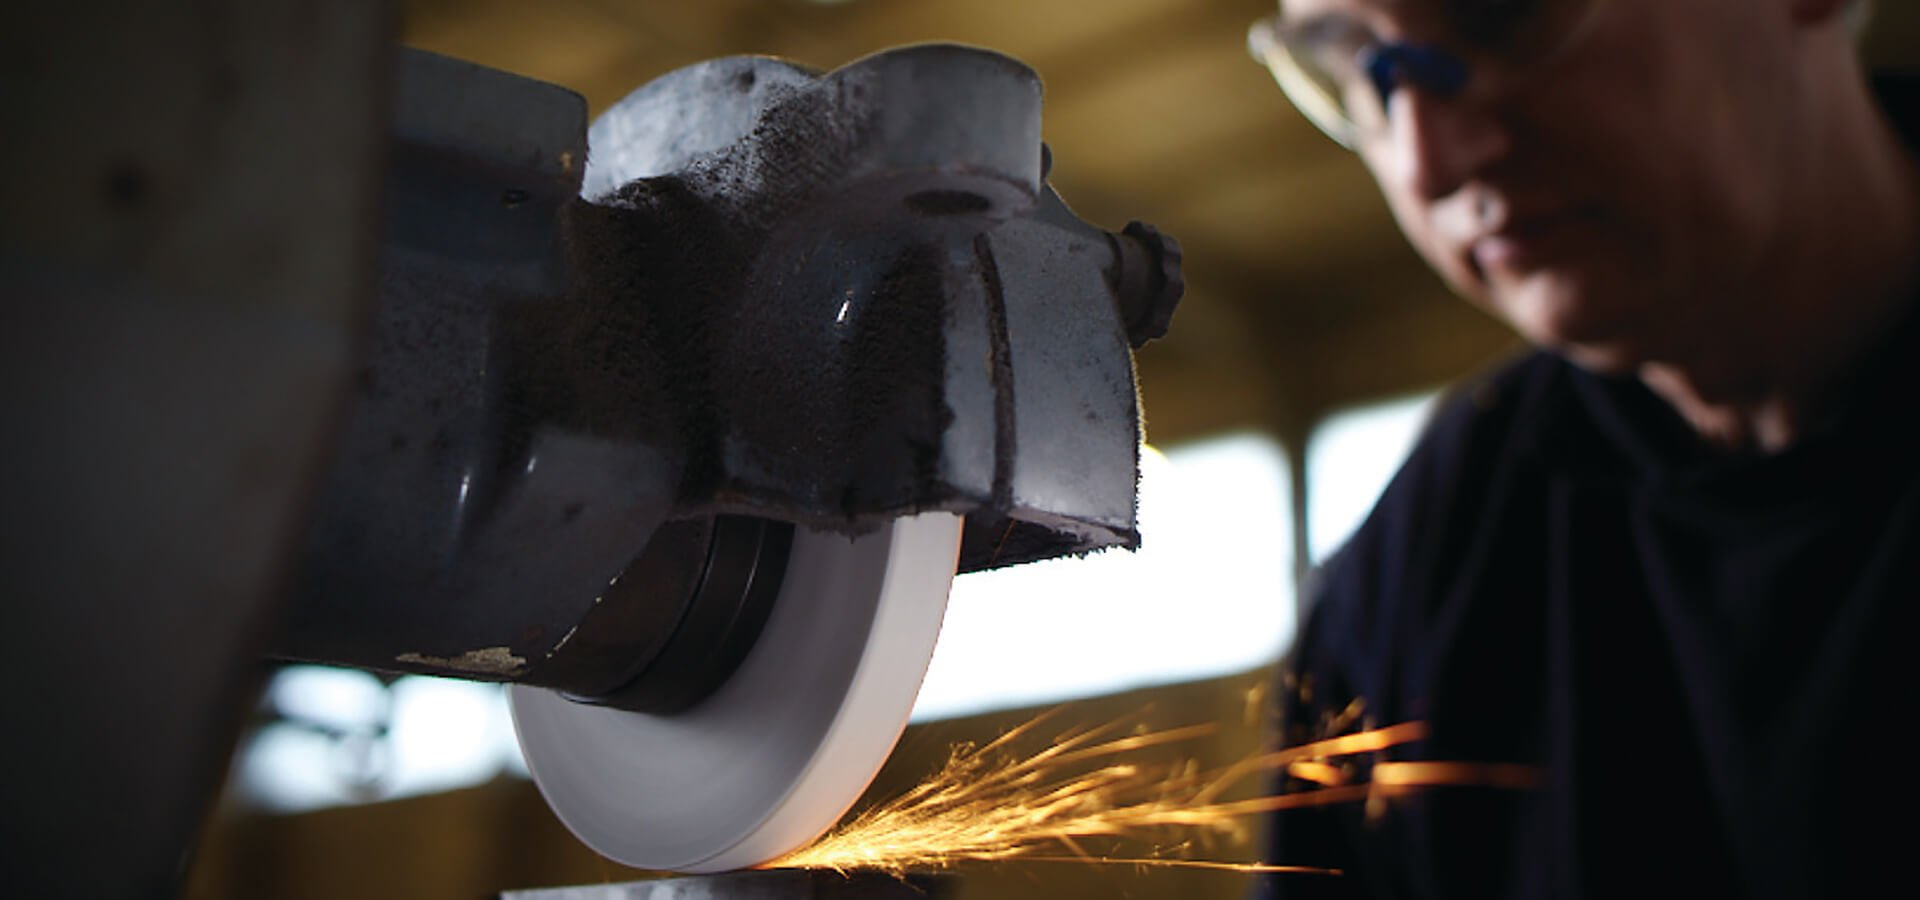 chitectural Ironmongery Manufacturer